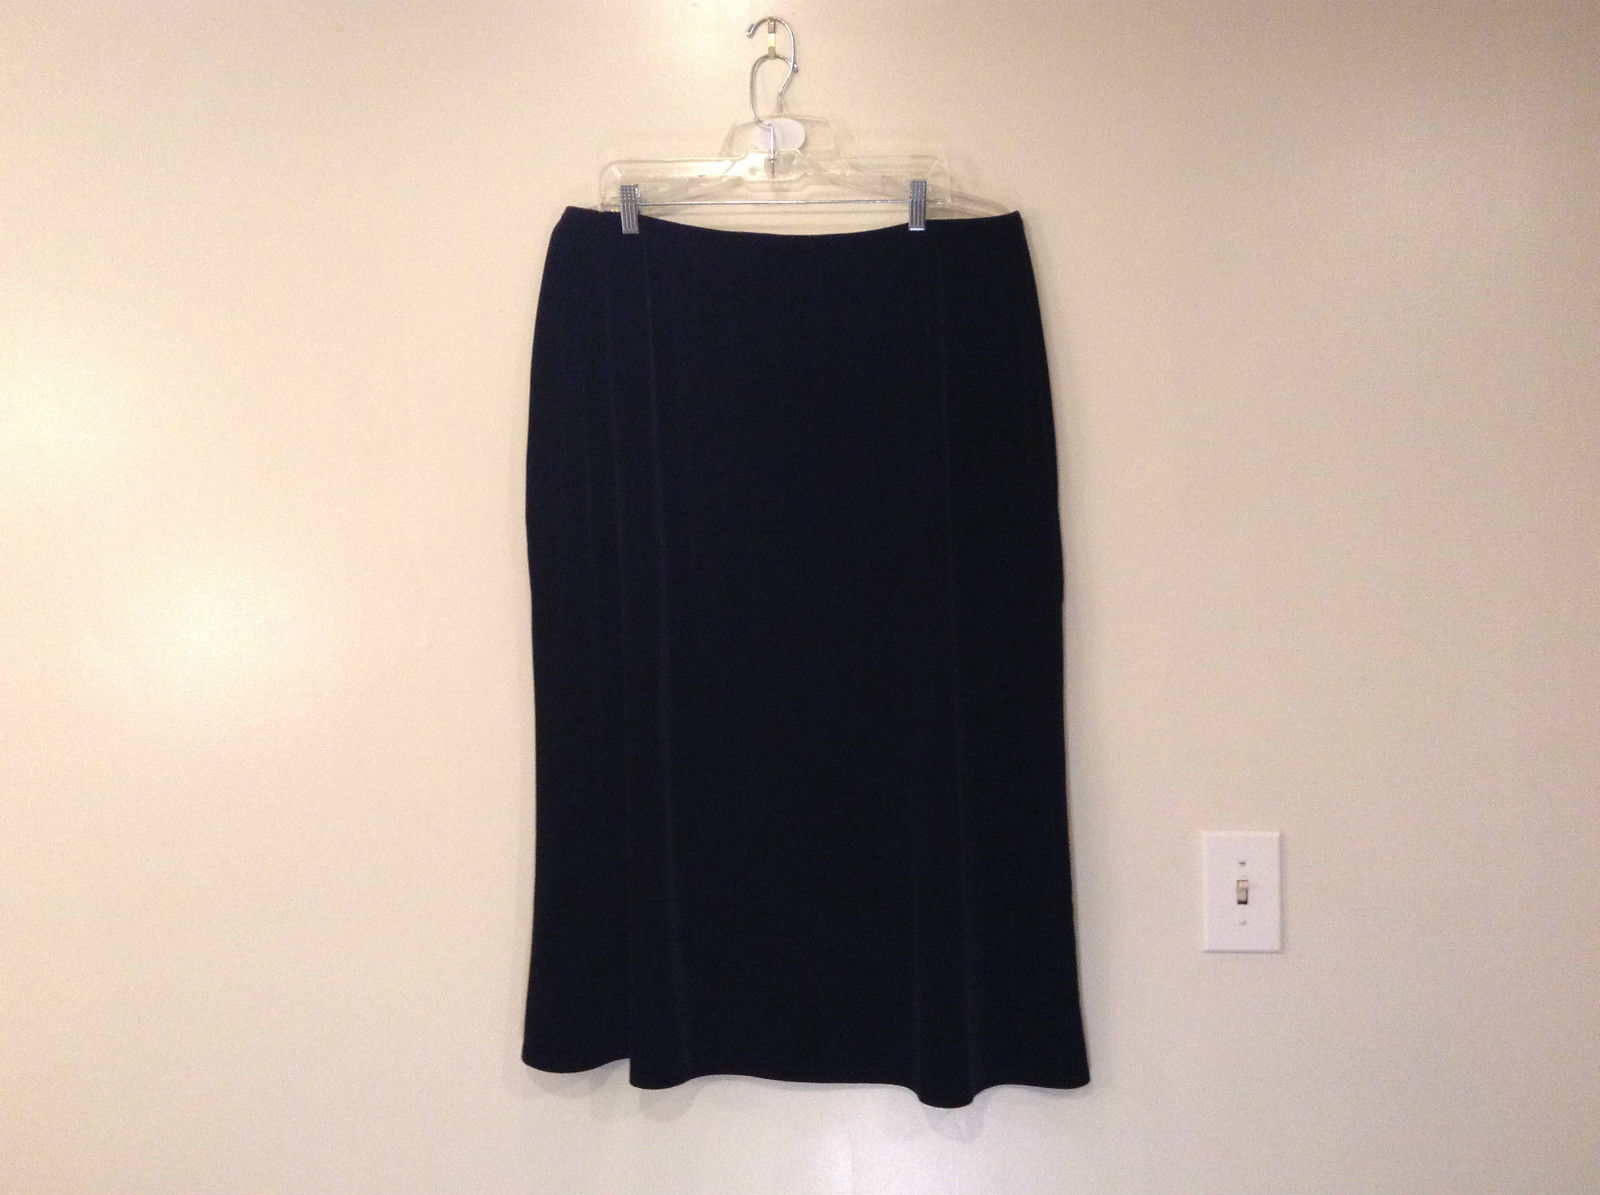 Kathie Lee Black Velvet Skirt Elastic Waist Straight No Slits Size 22W to 24W